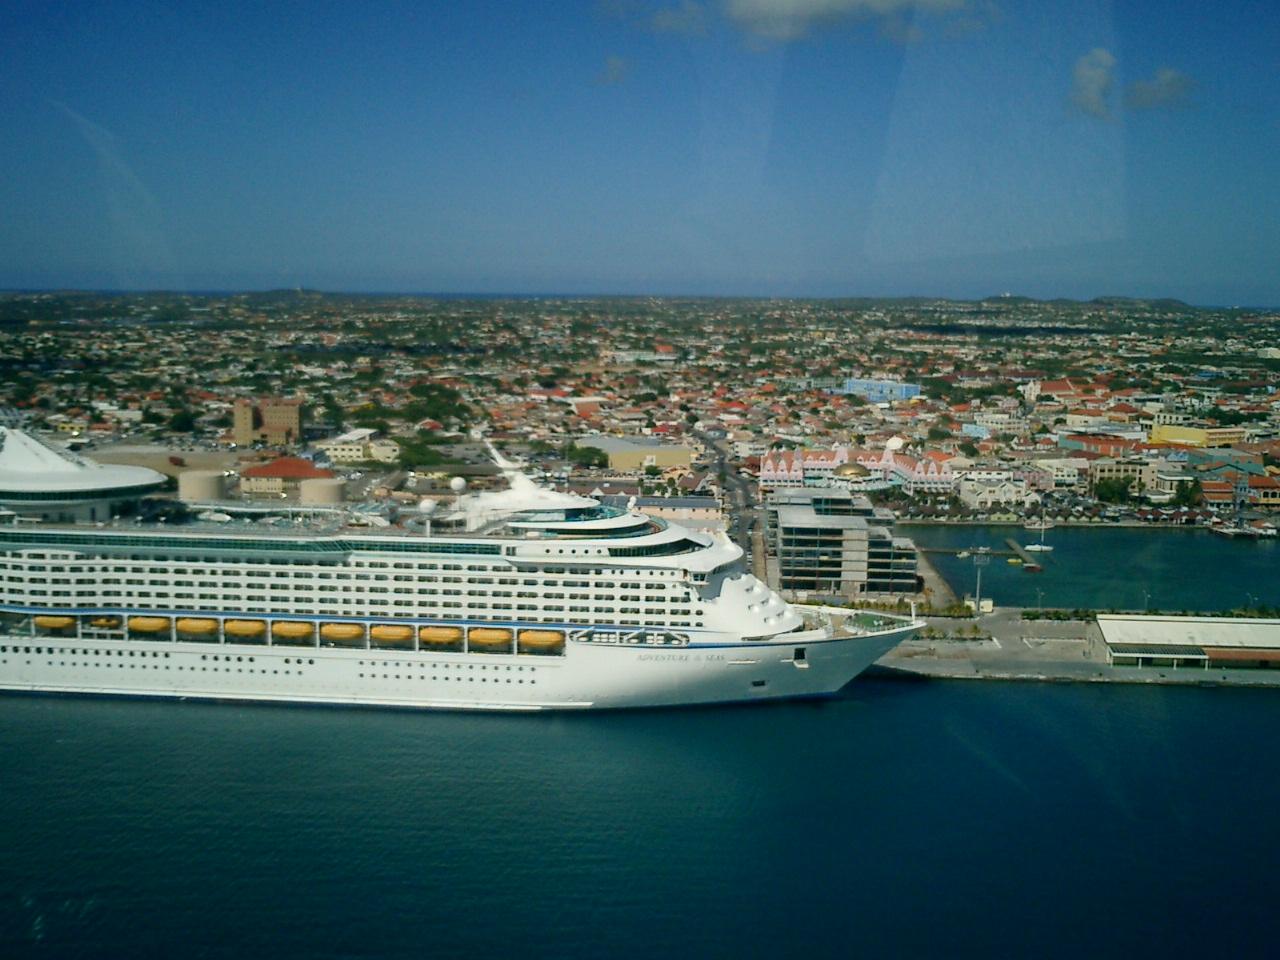 FileAruba Cruise Ship Terminal Panoramio Jpg Wikimedia - Cruise ships in aruba